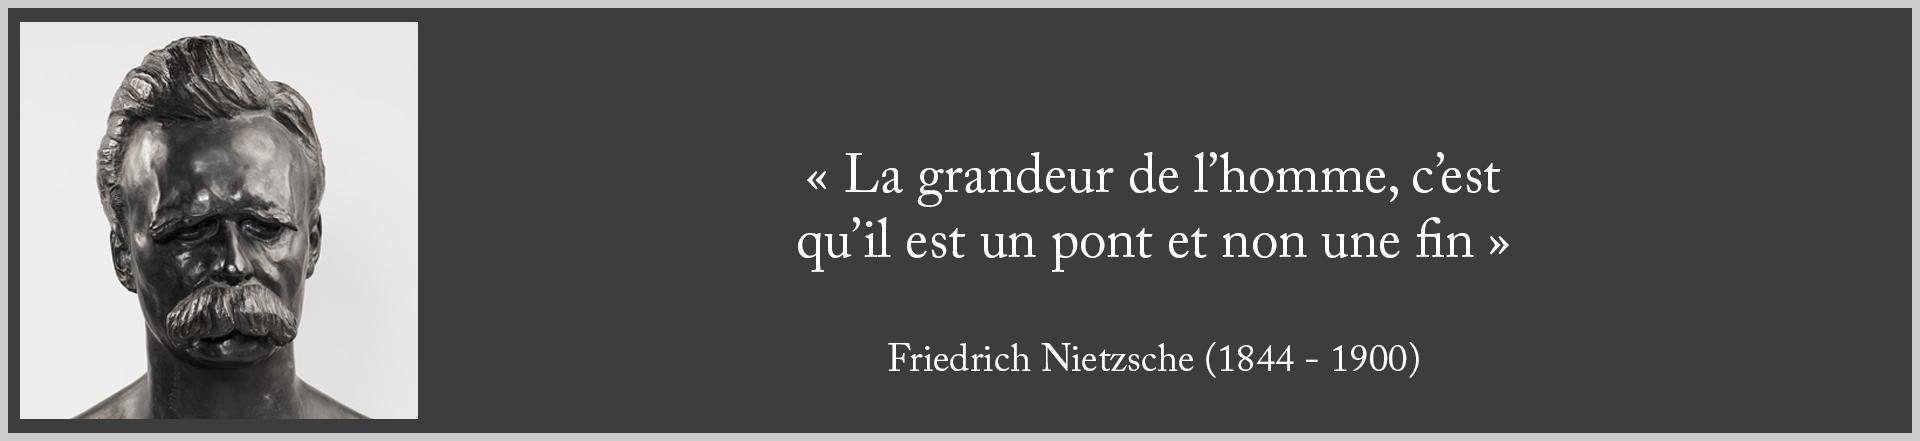 Friedrich Nietzsche dpurb site web